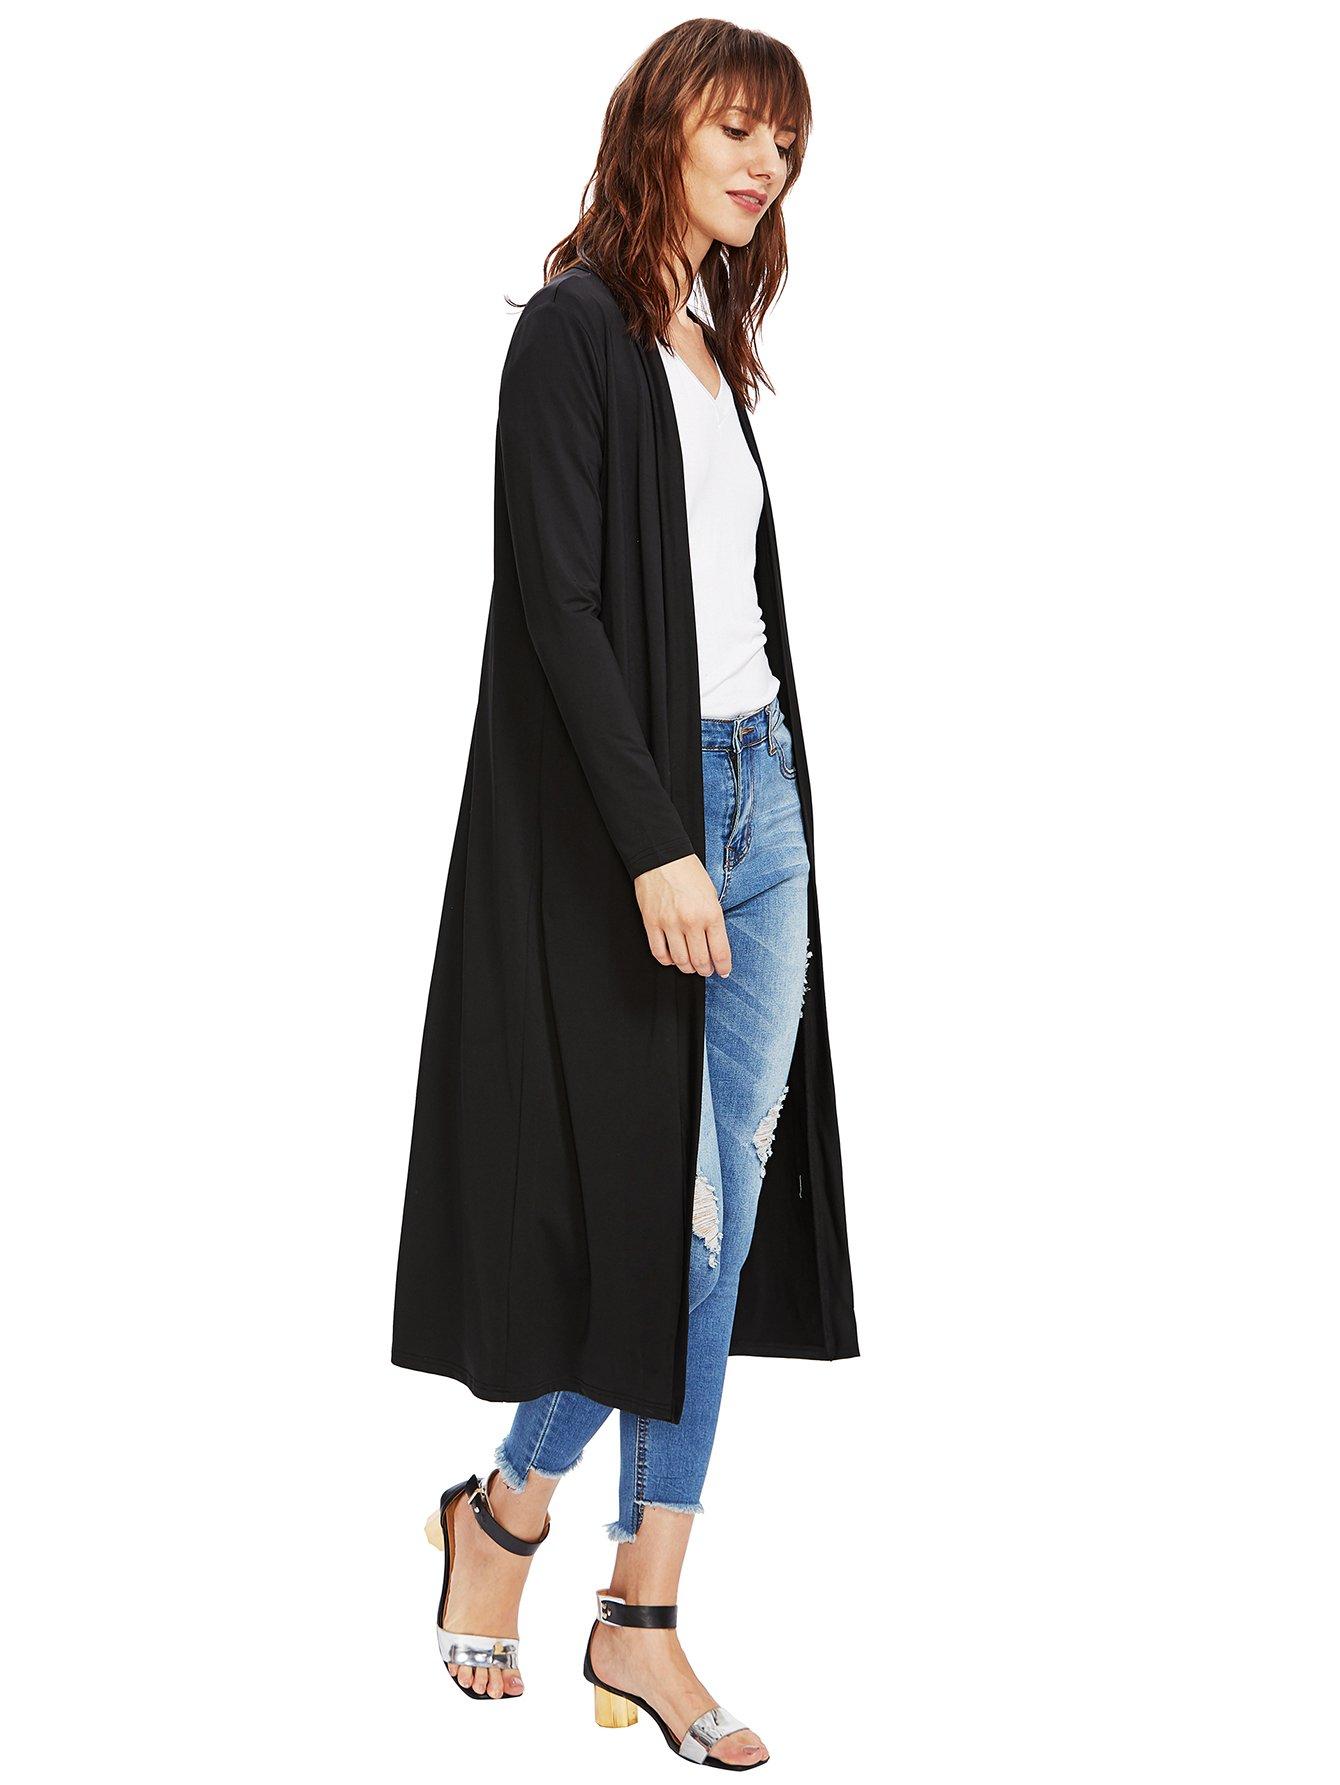 Verdusa Women's Long Sleeve Open Front Long Maxi Cardigan Longline Duster Coat Black M by Verdusa (Image #6)